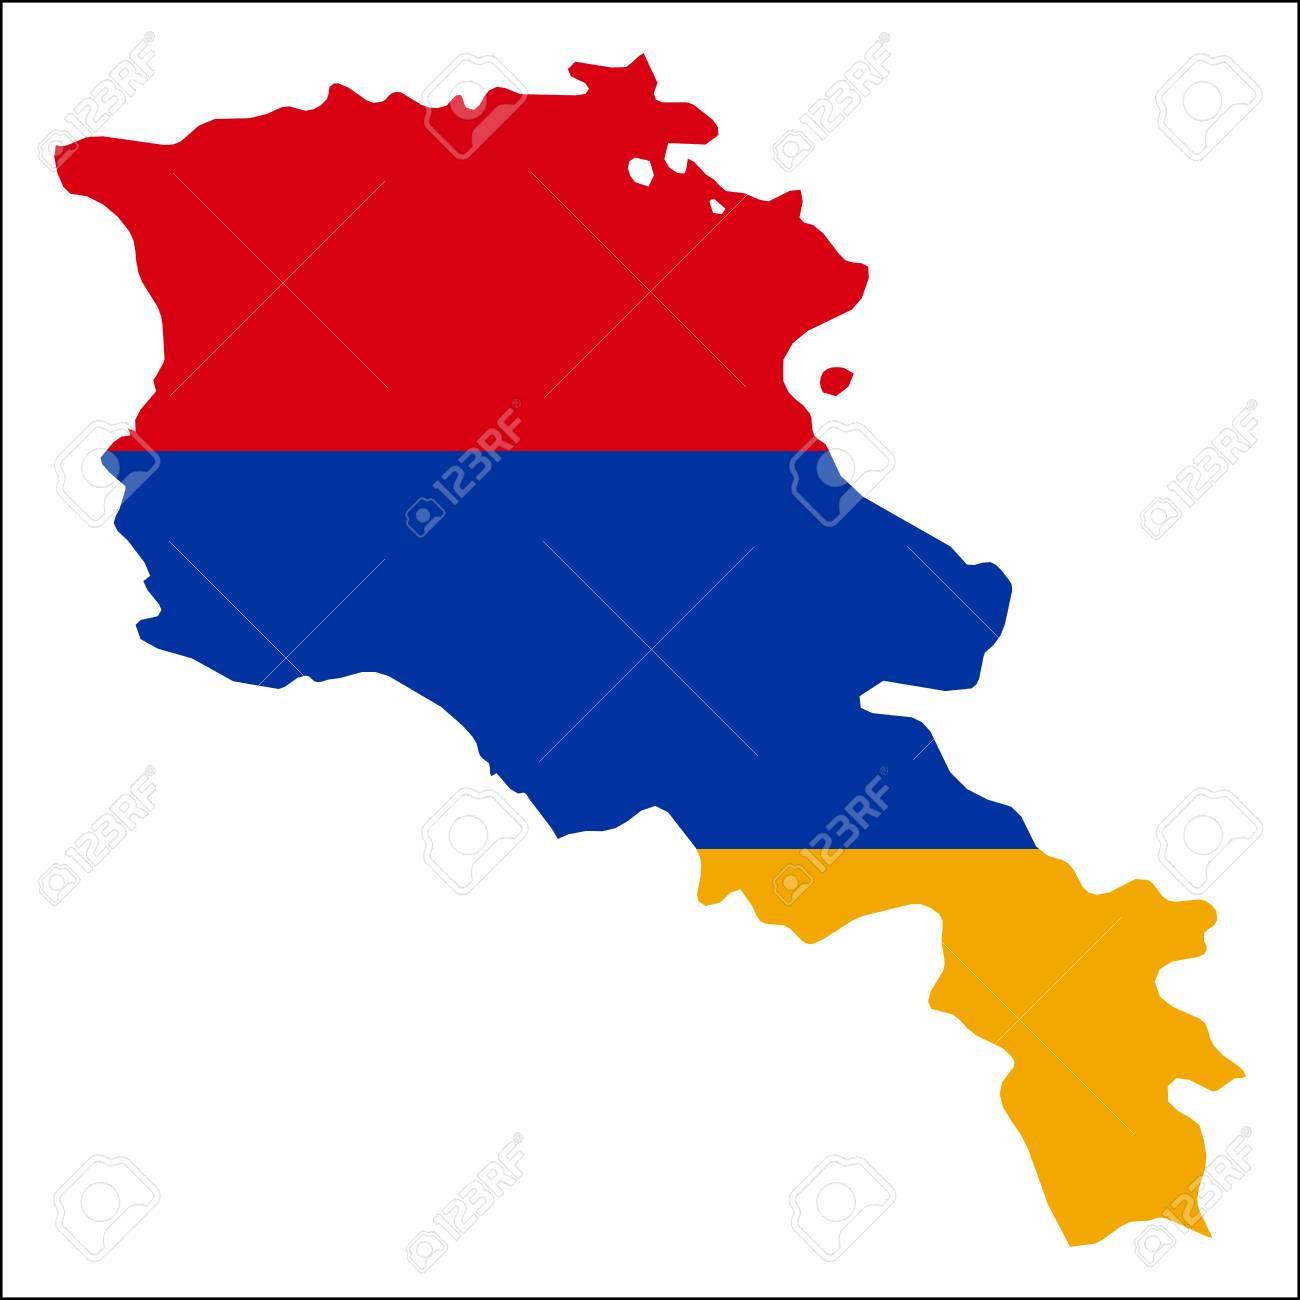 Armenien Karte.Stock Photo